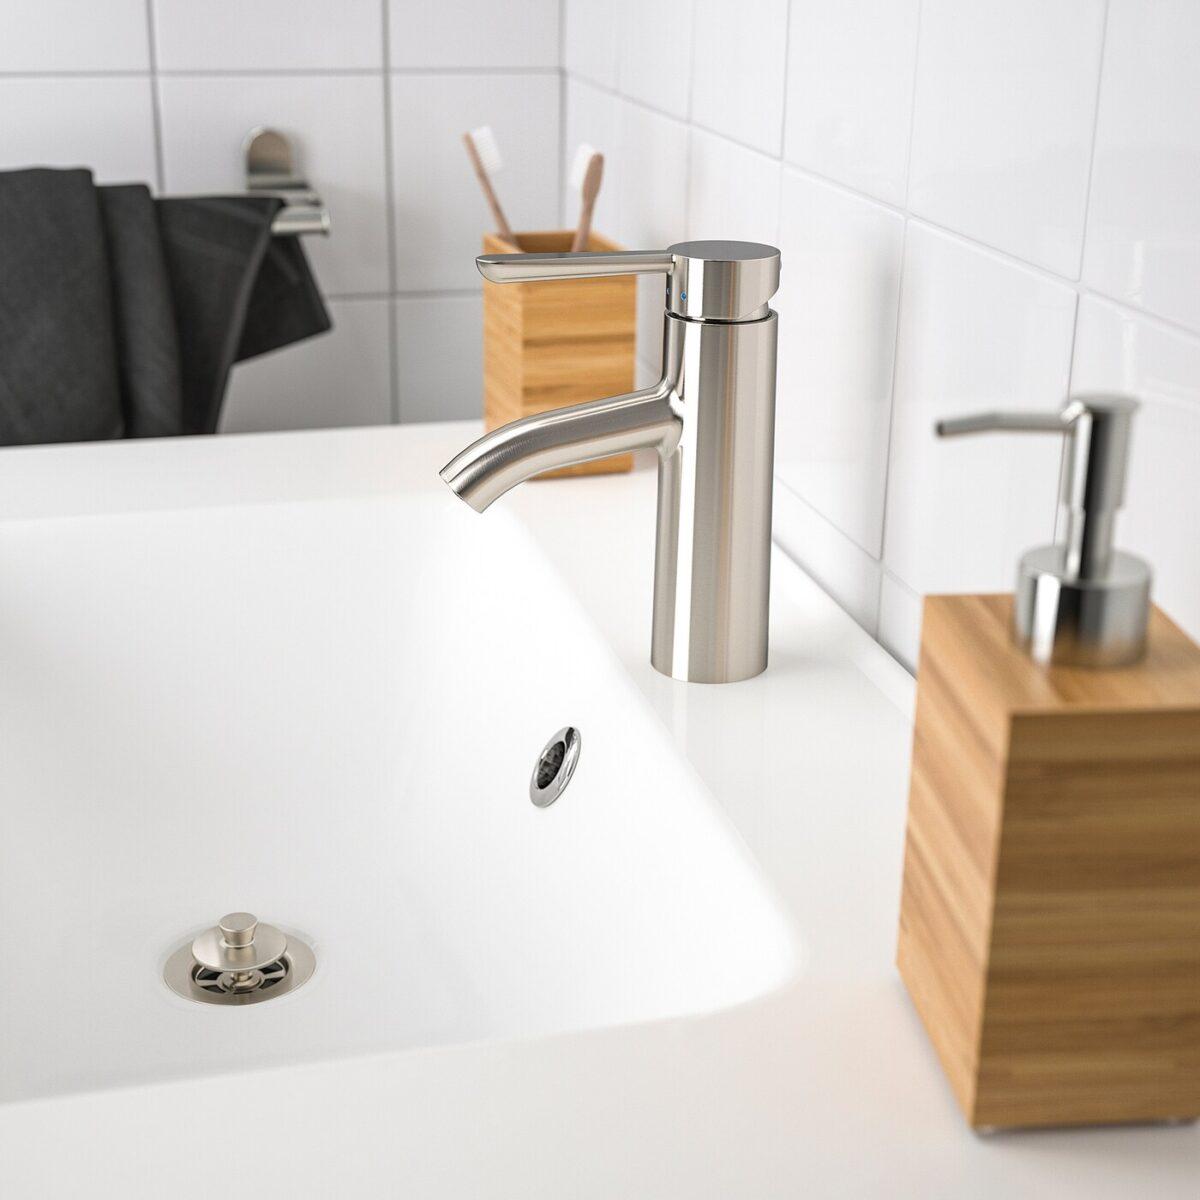 10-idee-per-arredare-un-bagno-cieco-8